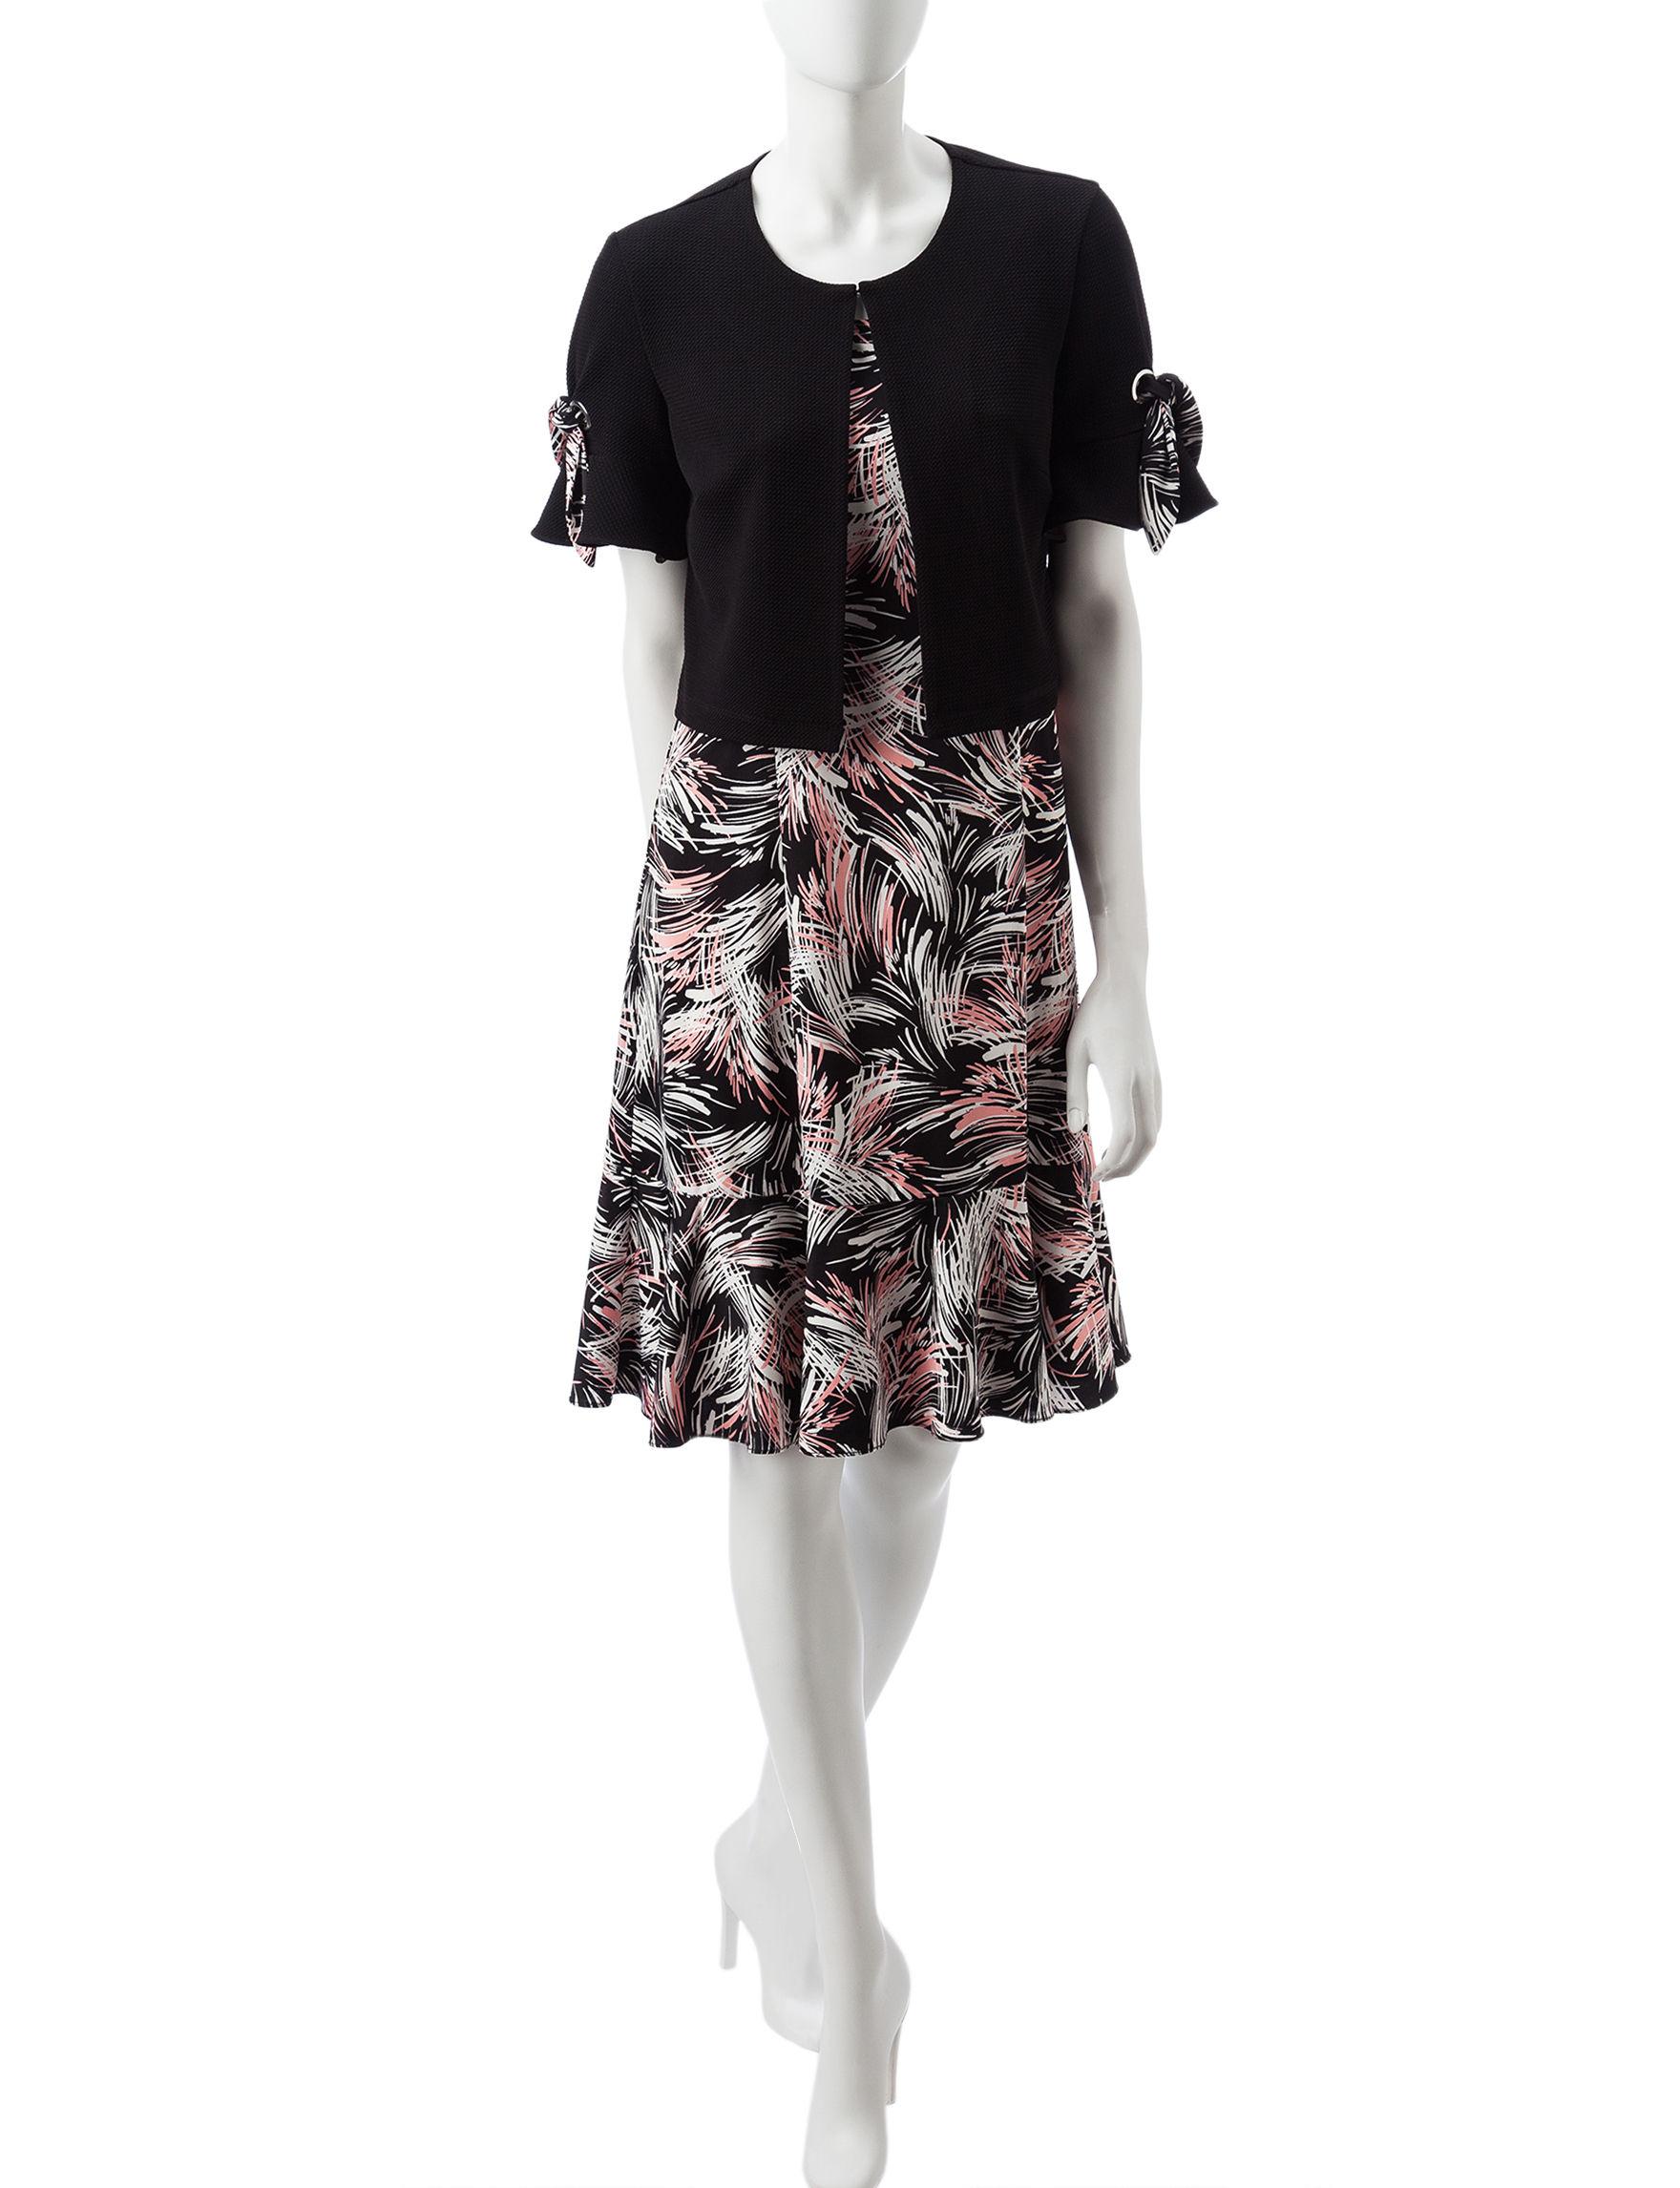 Perceptions Black / Blush Everyday & Casual Jacket Dresses